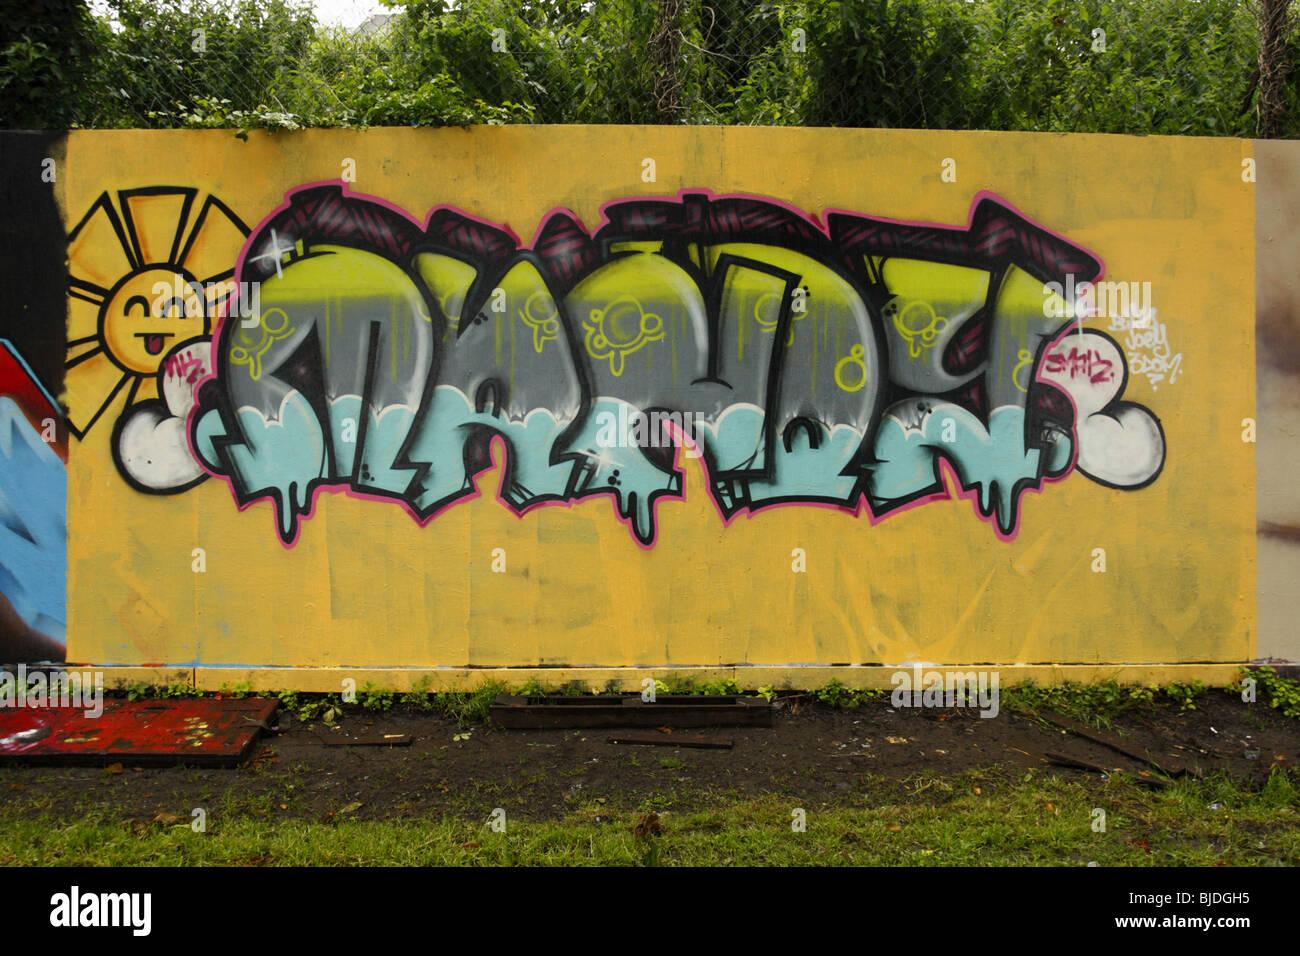 Graffiti wall uk -  Artistic Graffiti On A Graffiti Wall Swansea West Glamorgan South Wales U K